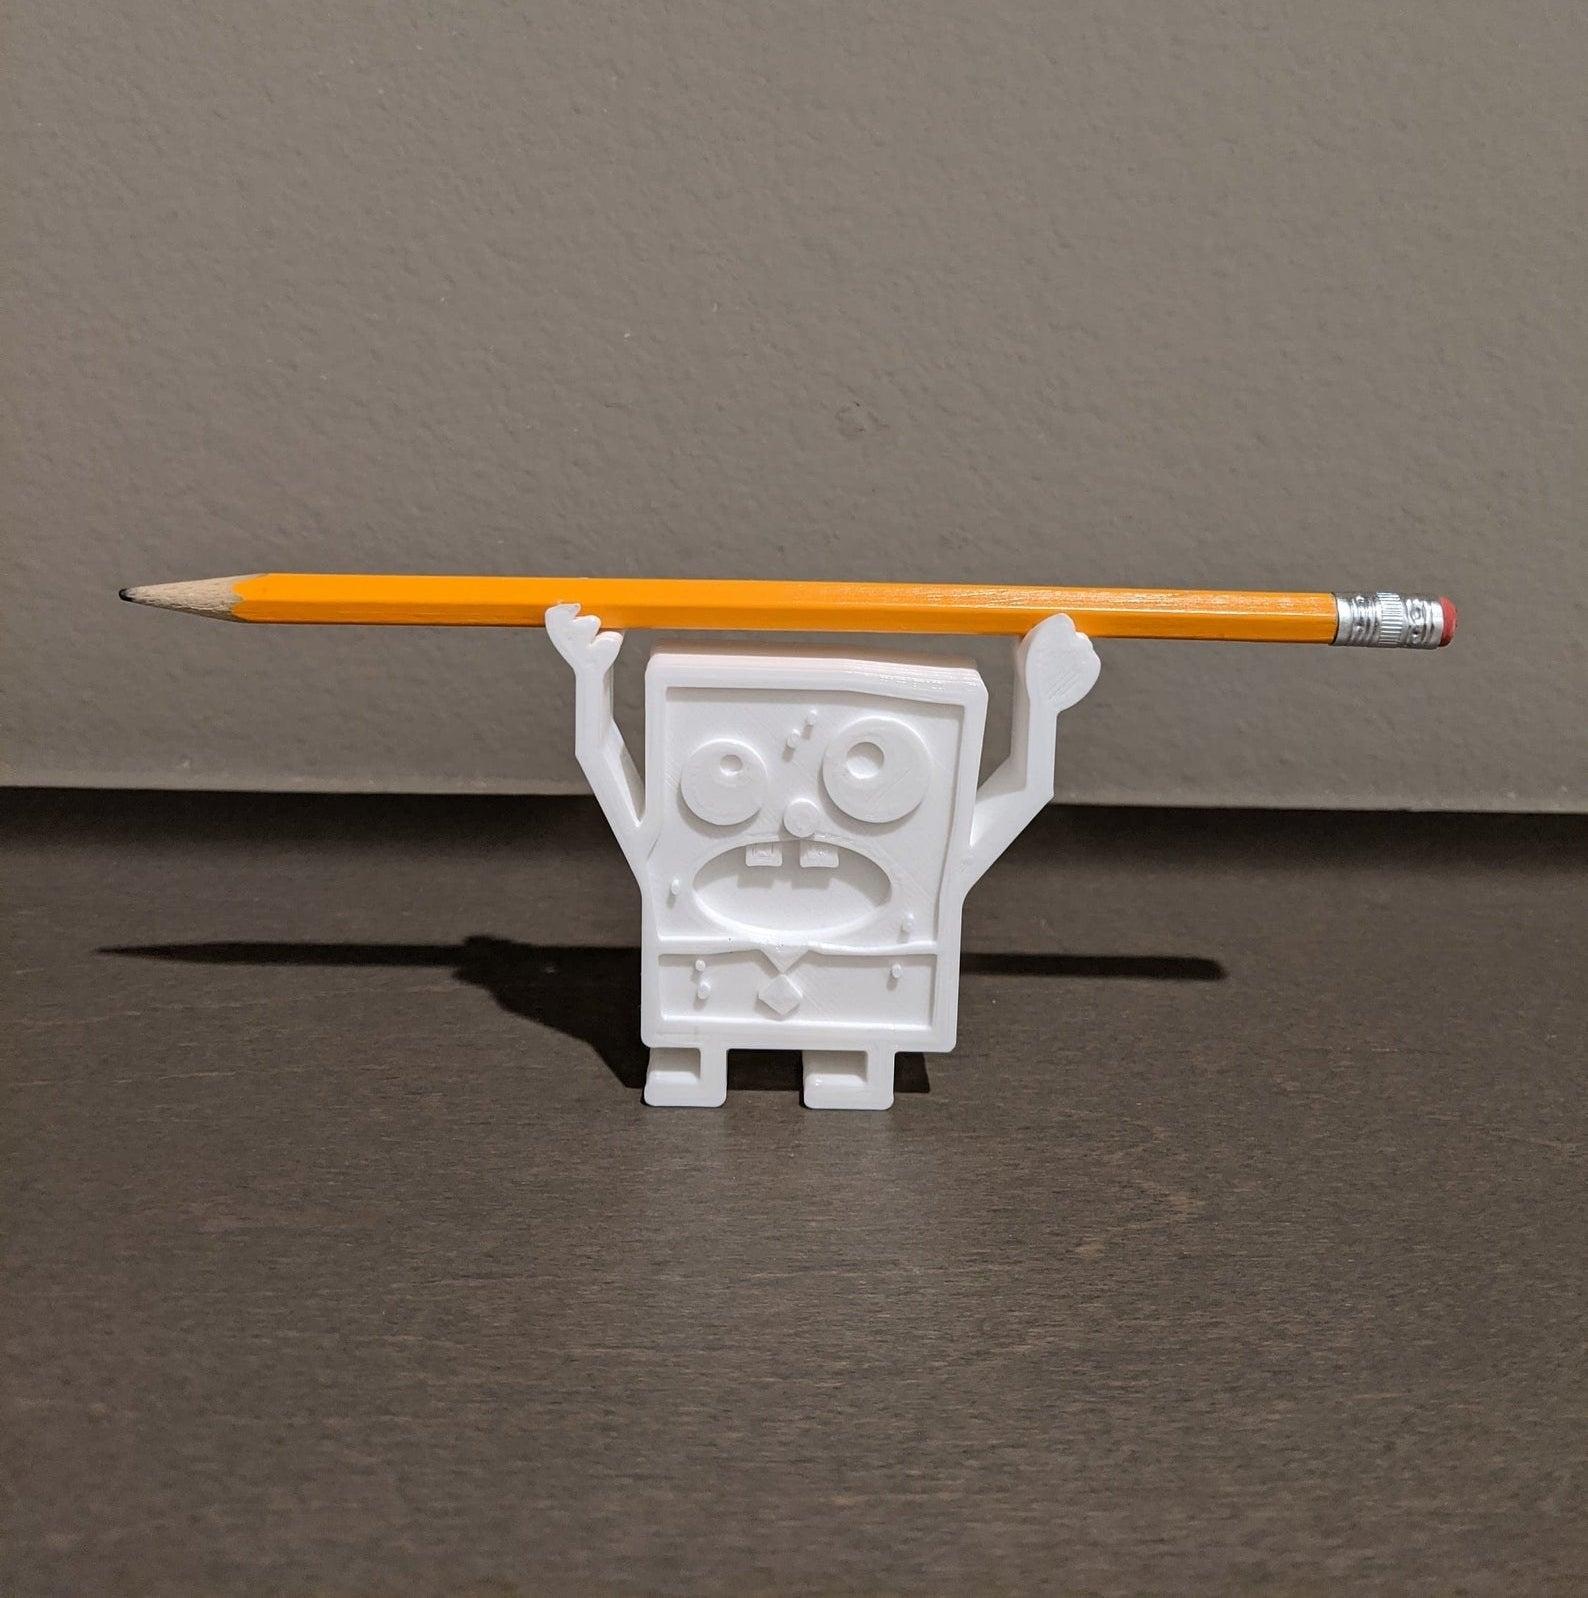 The Doodle Bob holding a pencil